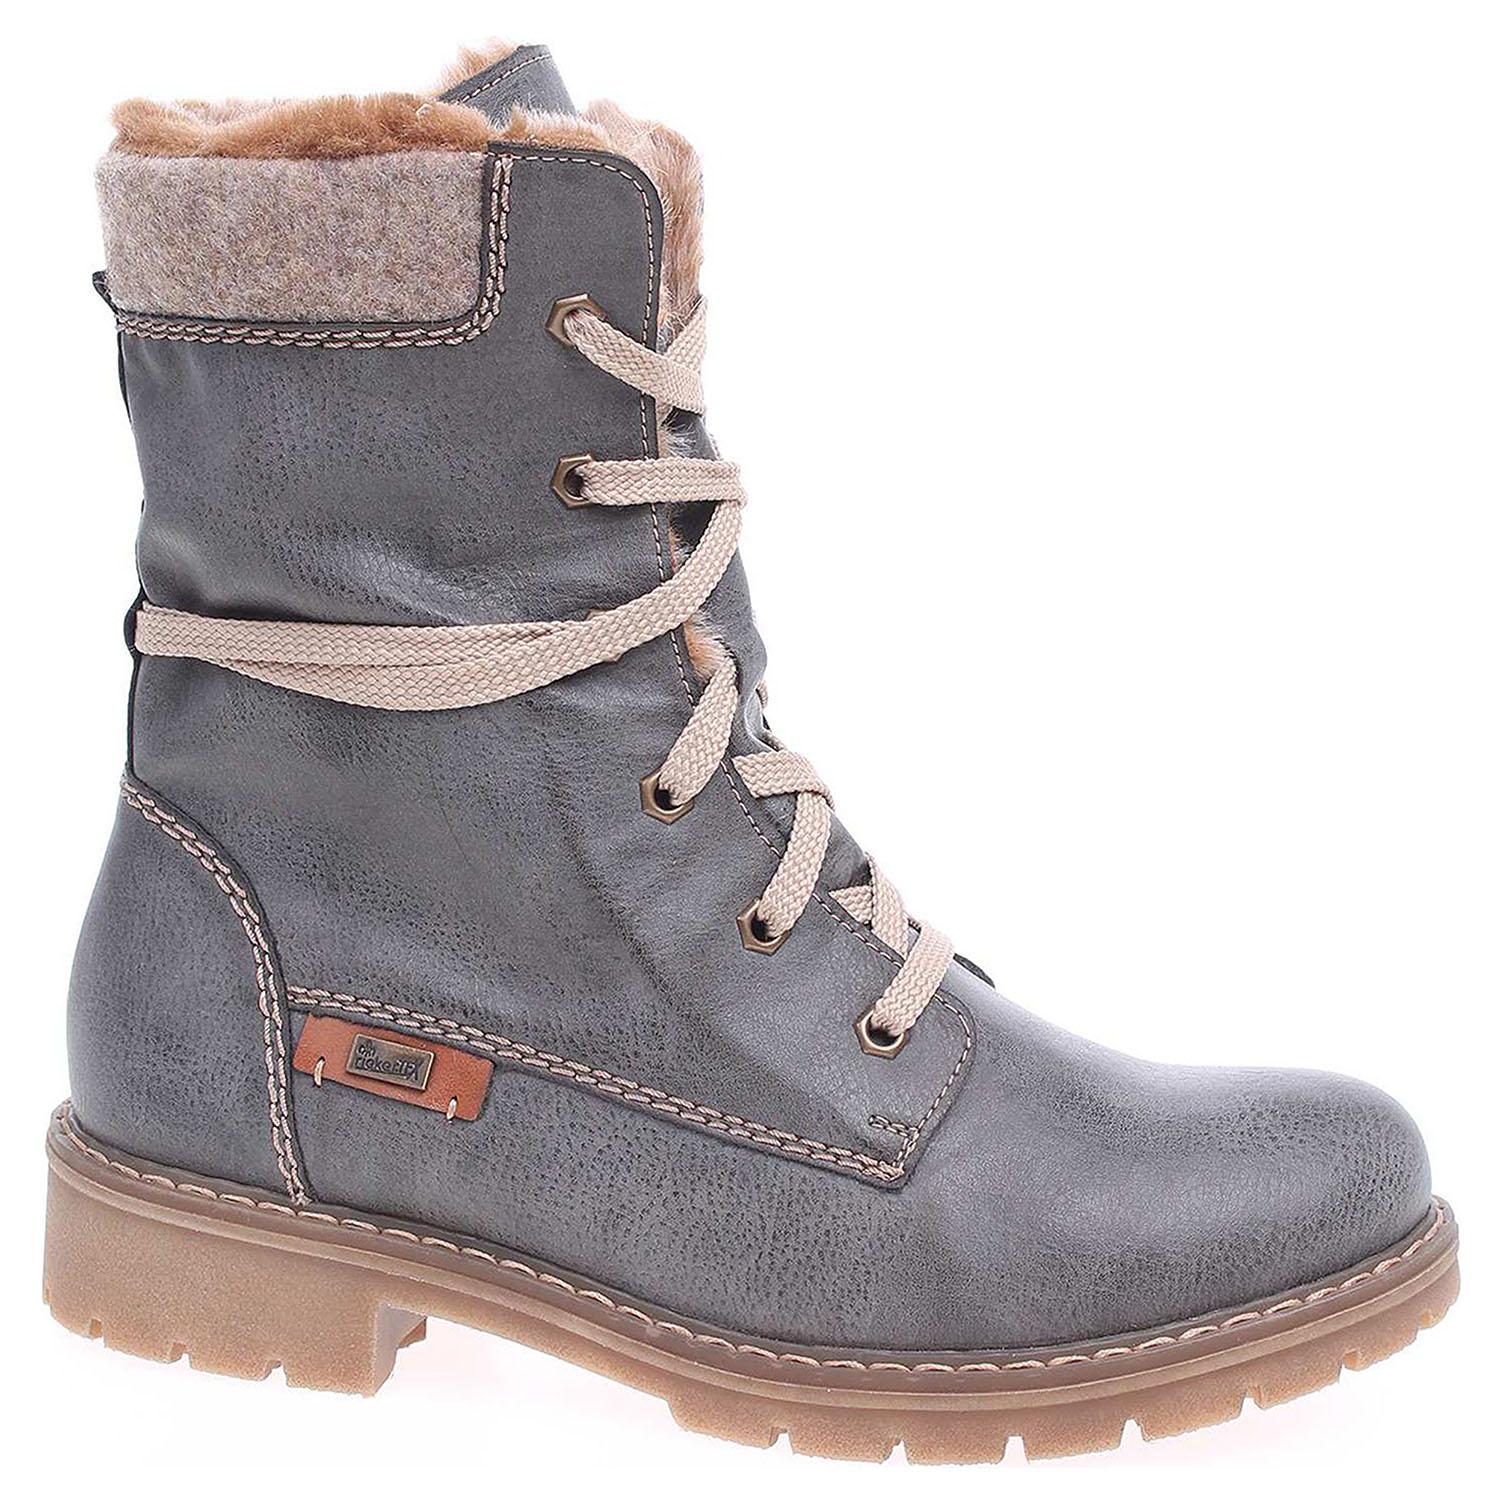 a67c3826a9b8 detail Dámská kotníková obuv Rieker Y9122-45 grau kombi